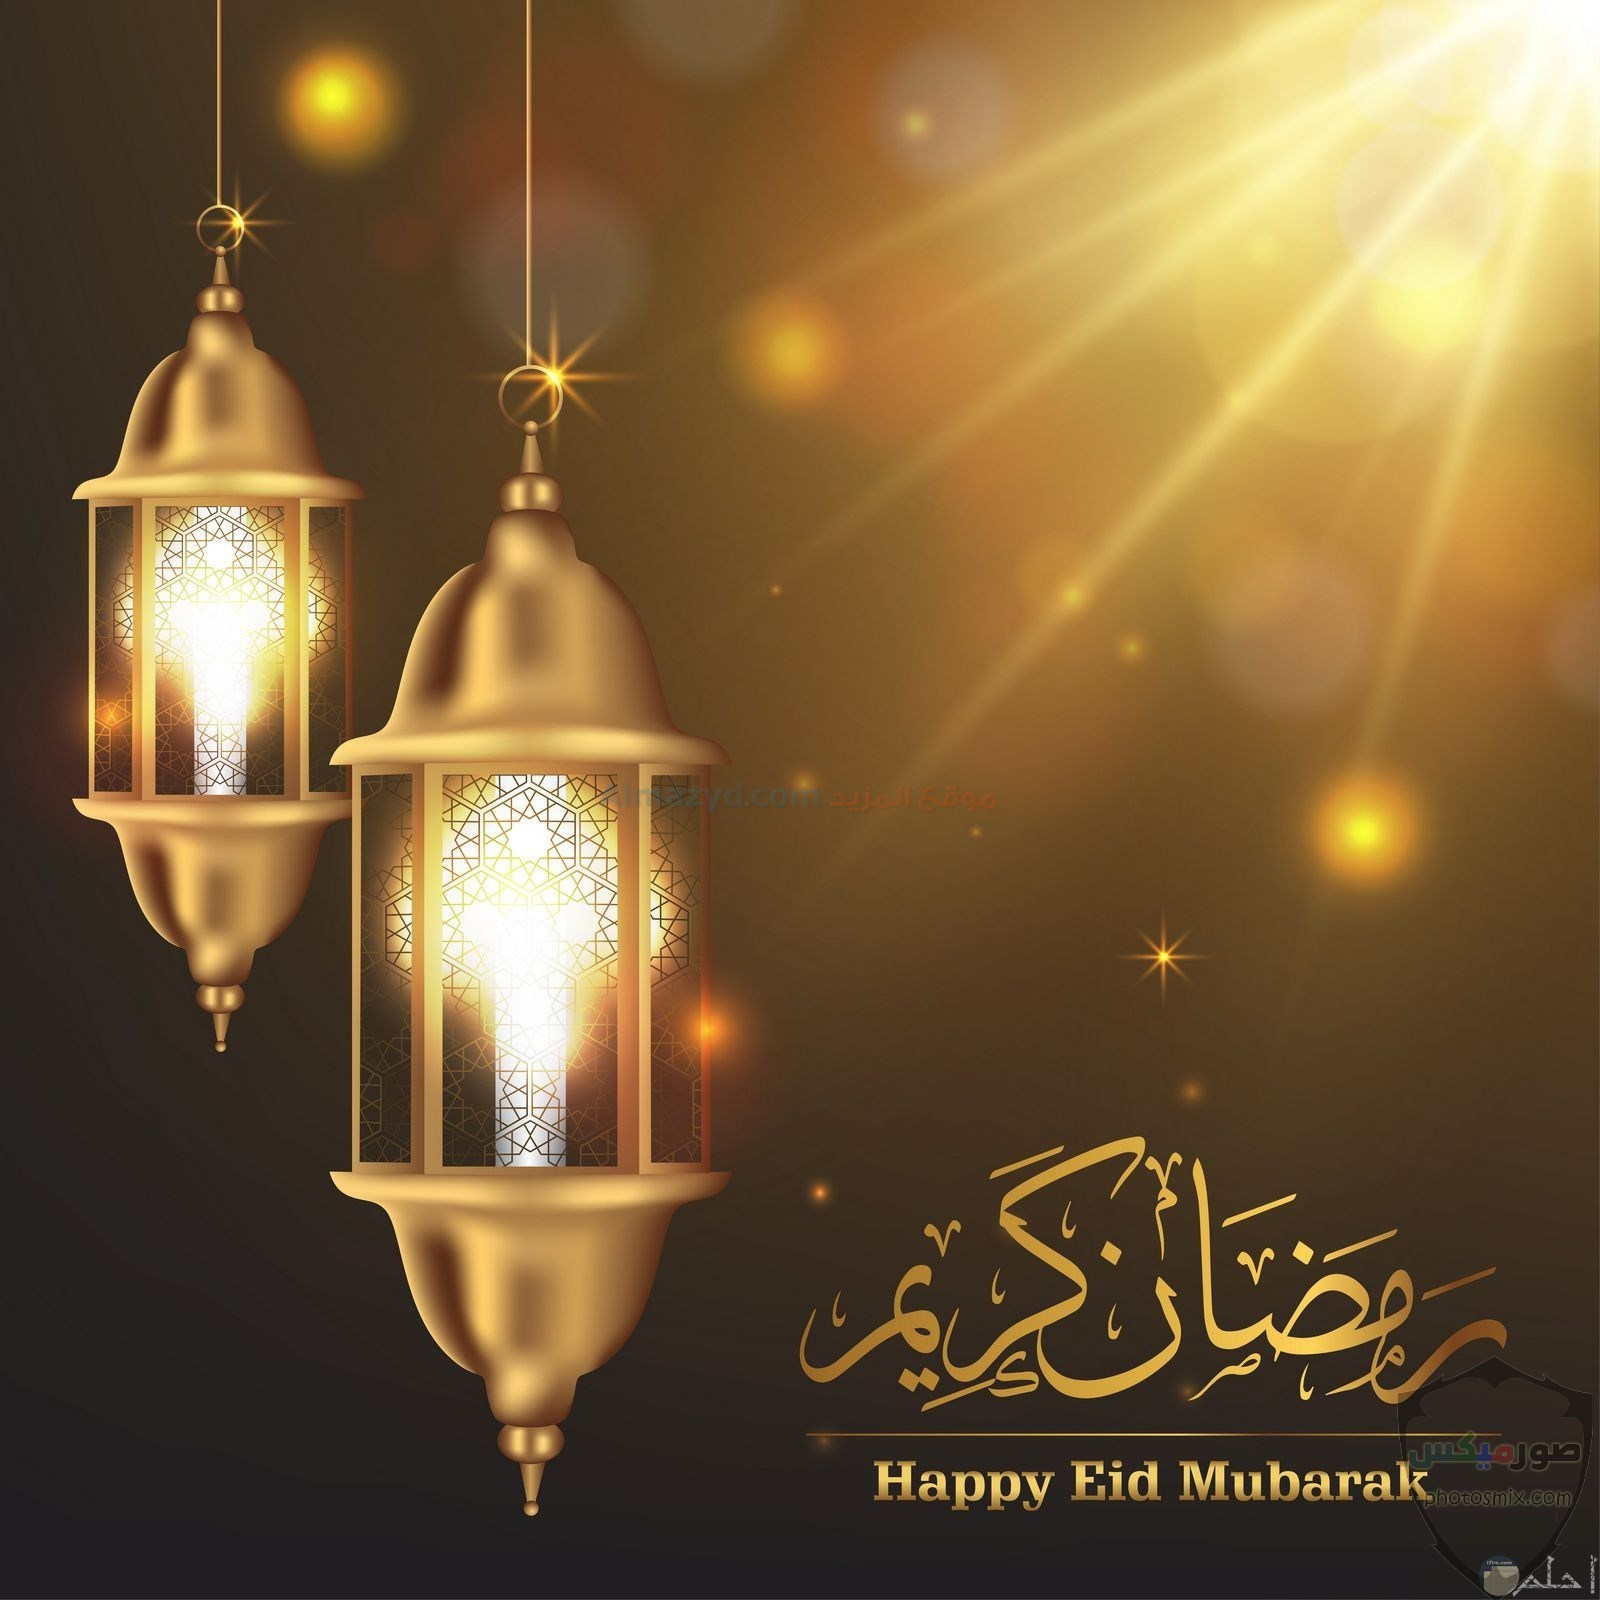 صور تهنئة بمناسبة رمضان 2020 13